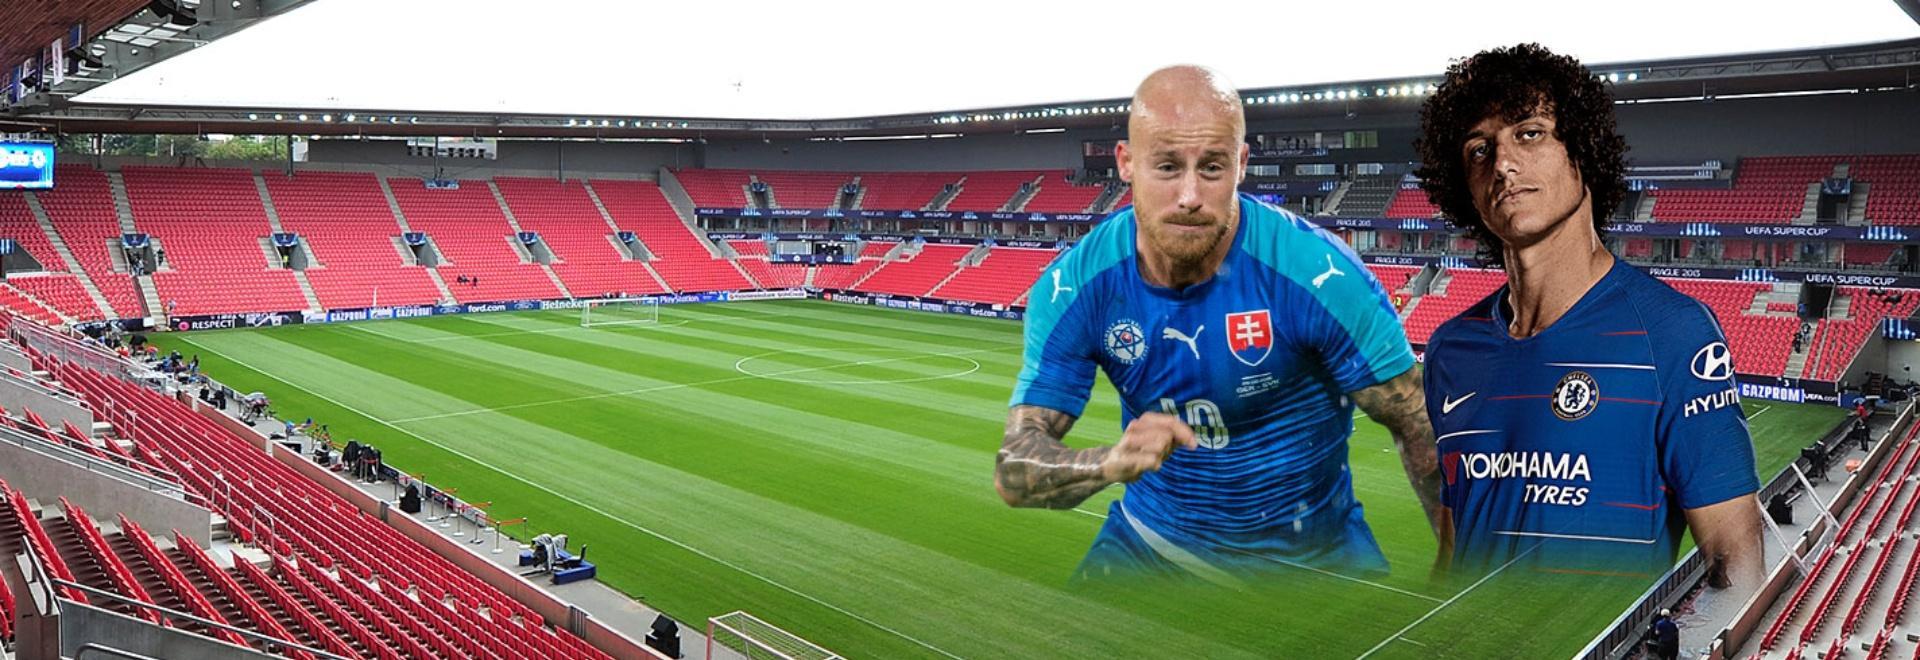 Slavia Praga - Chelsea. Quarti. Andata